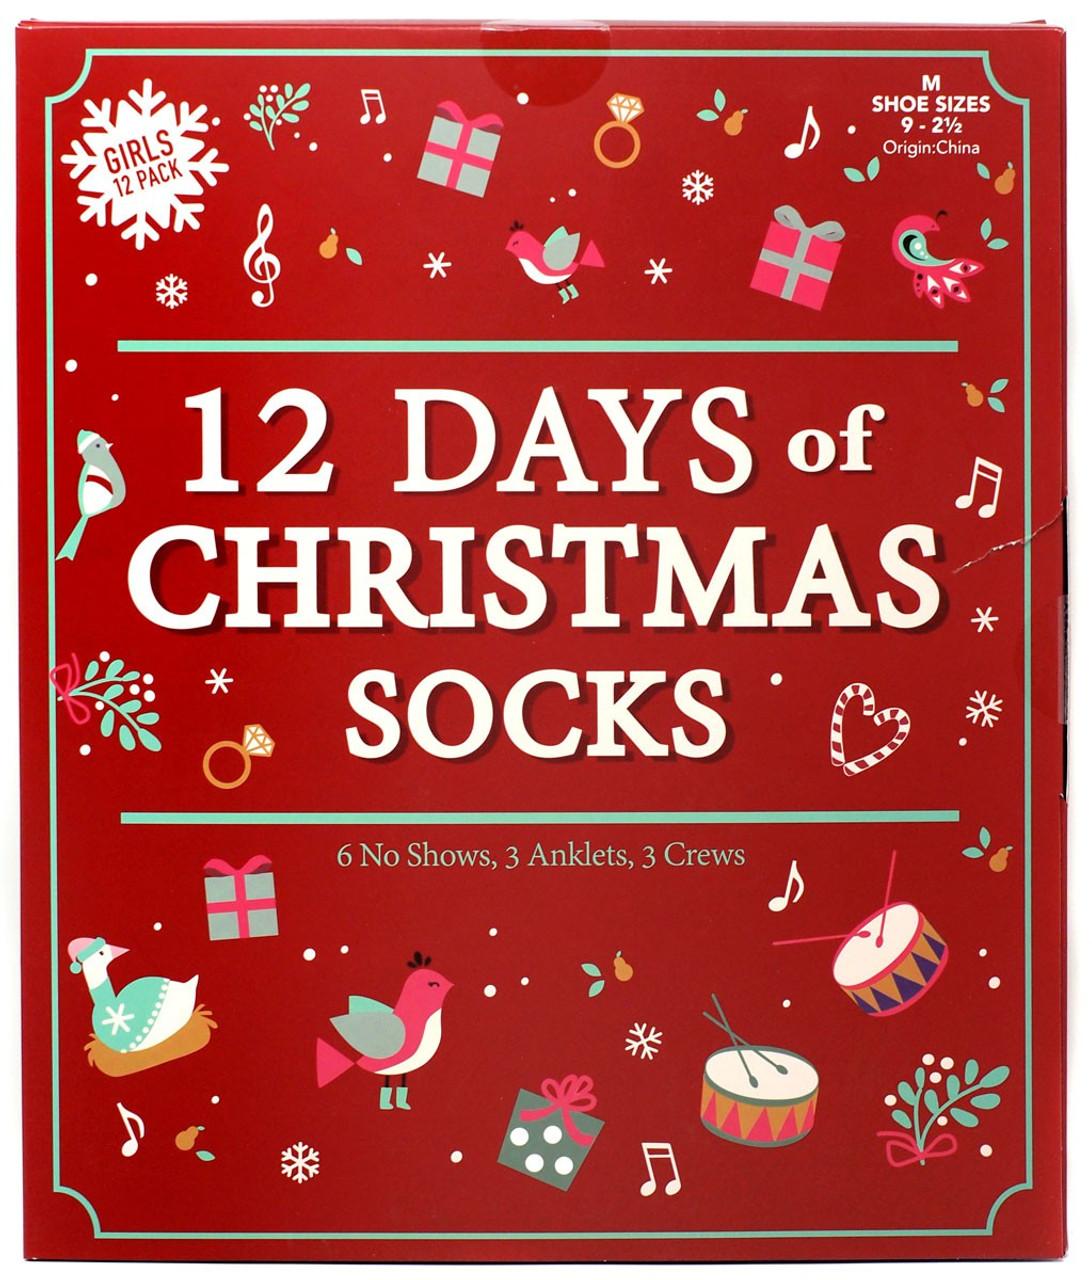 Origin Of 12 Days Of Christmas.12 Days Of Socks Girls 12 Days Of Christmas Socks 12 Pack Shoe Sizes 9 2 5